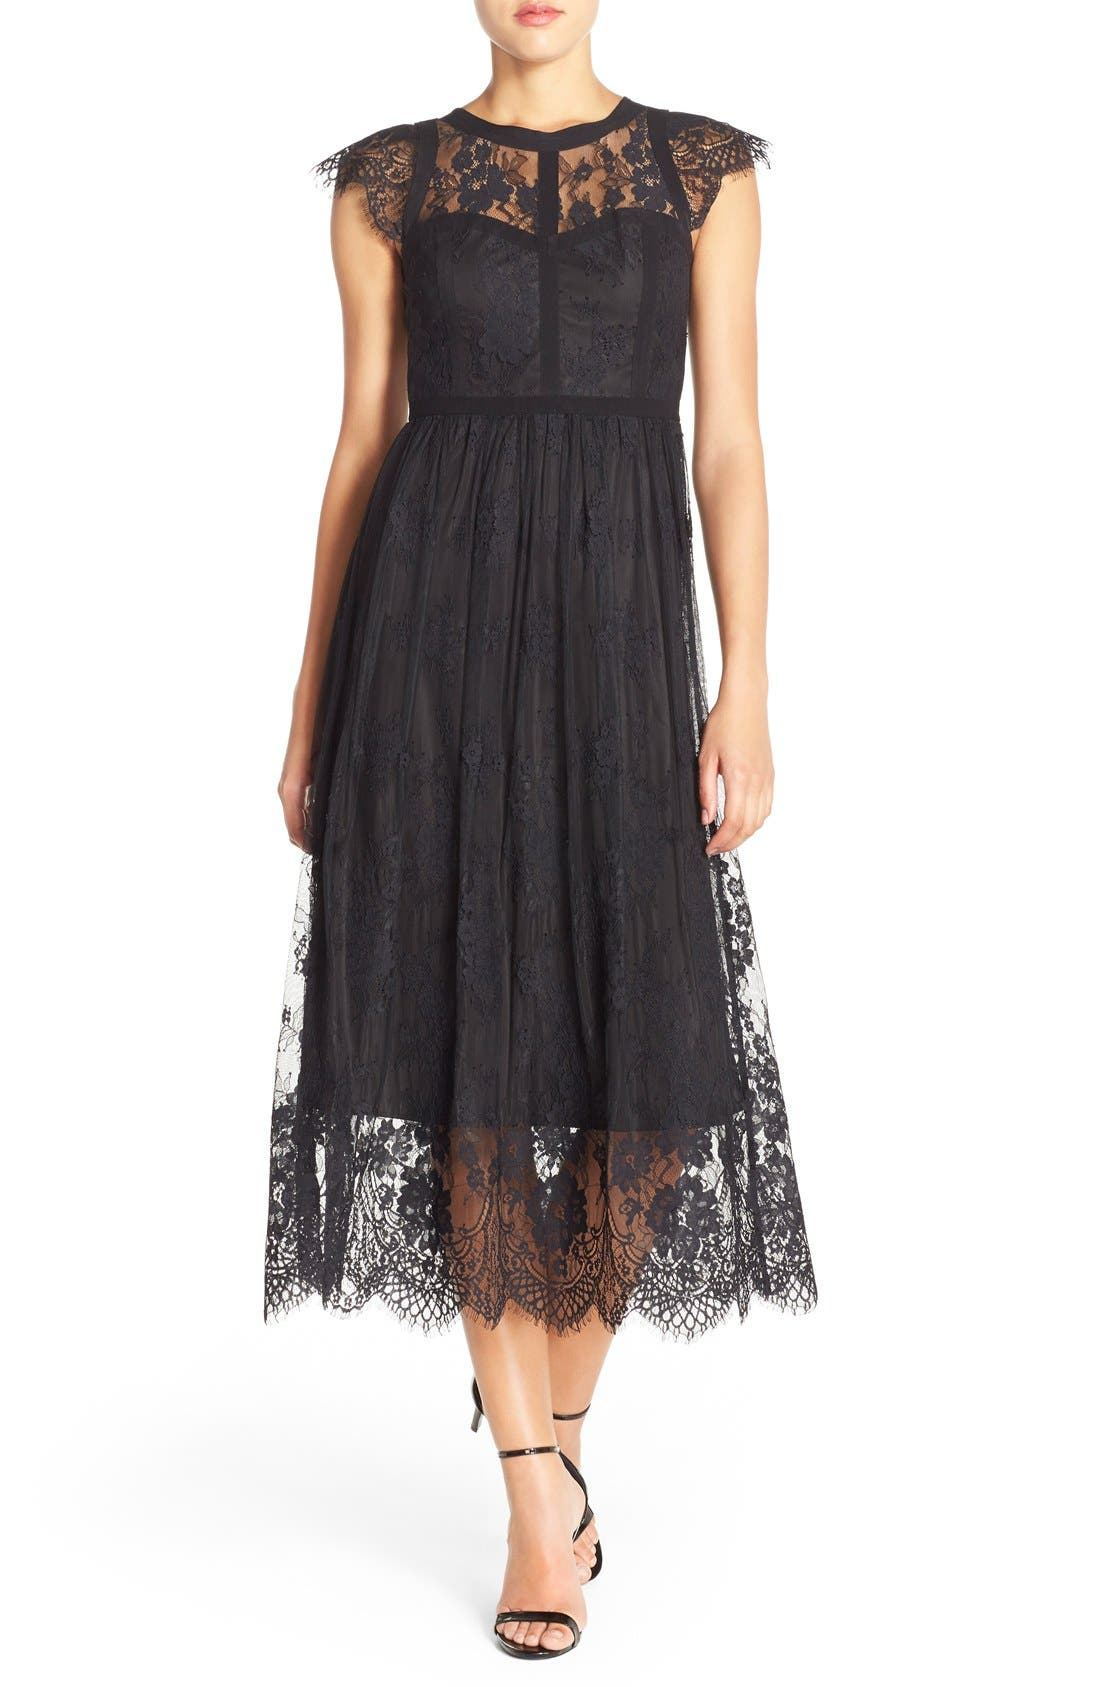 Alternate Image 1 Selected - Parker 'Tesoro' Lace Fit & Flare Midi Dress